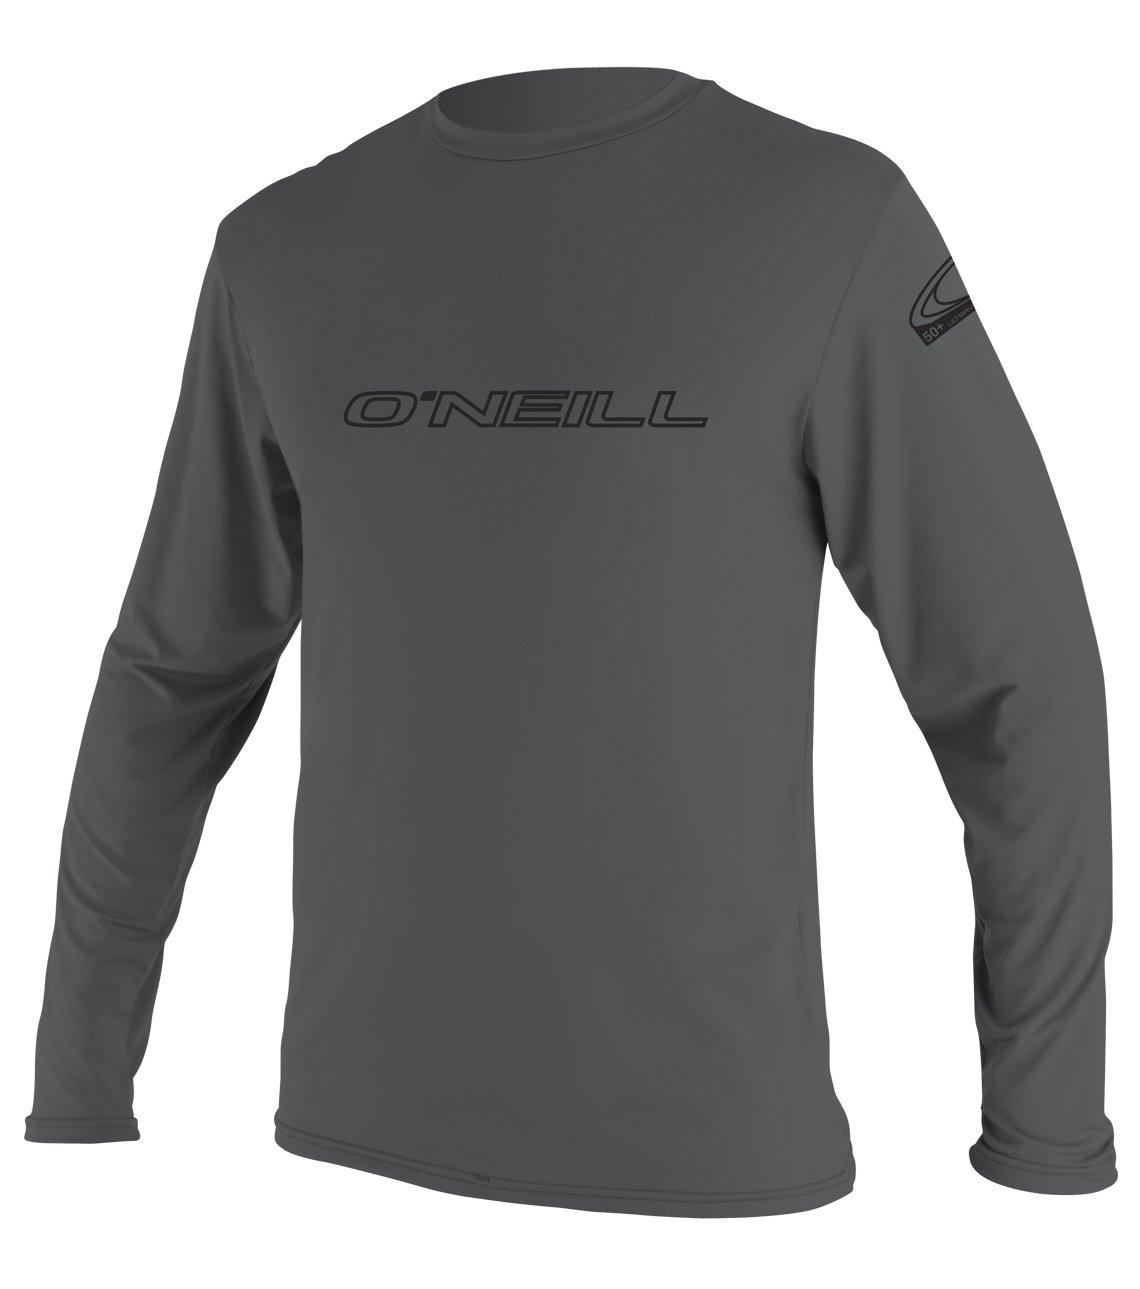 O'Neill   Men's Basic Skins UPF 50+ Long Sleeve Sun Shirt,Smoke,XX-Large by O'Neill Wetsuits